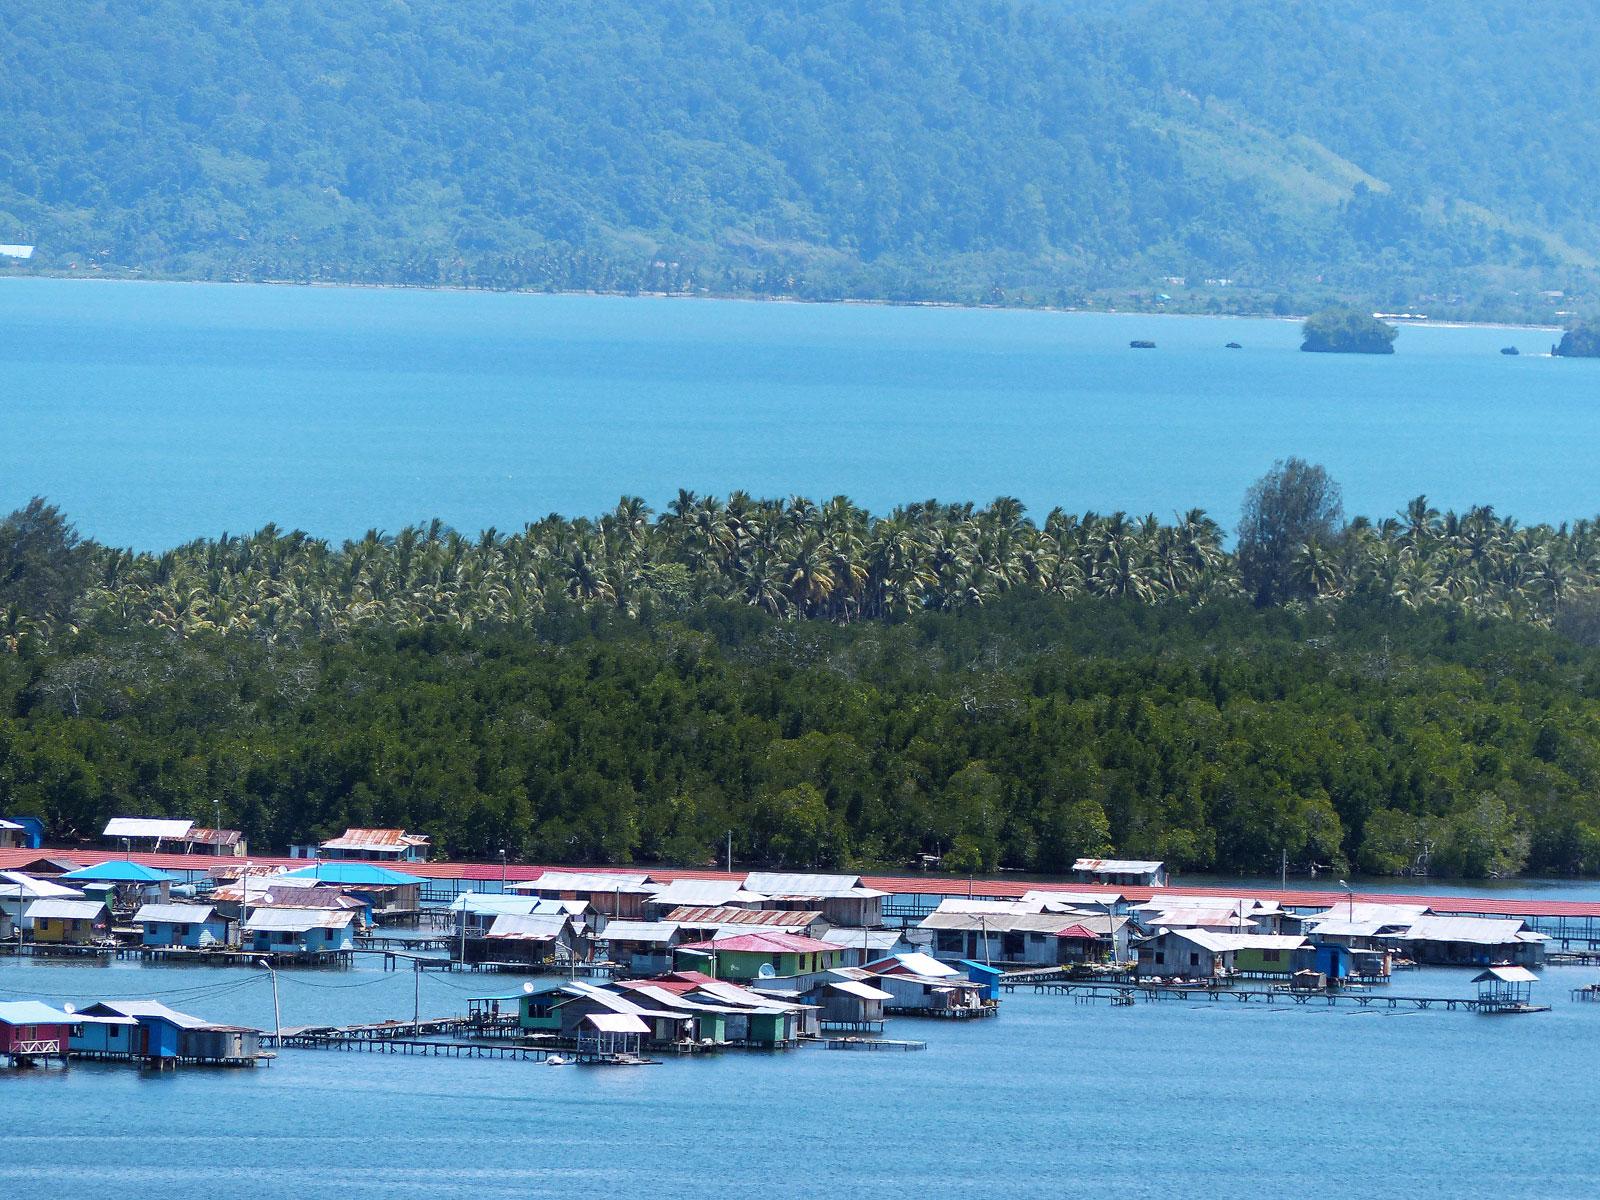 rondreis papua jayapura hoogtepunt 22